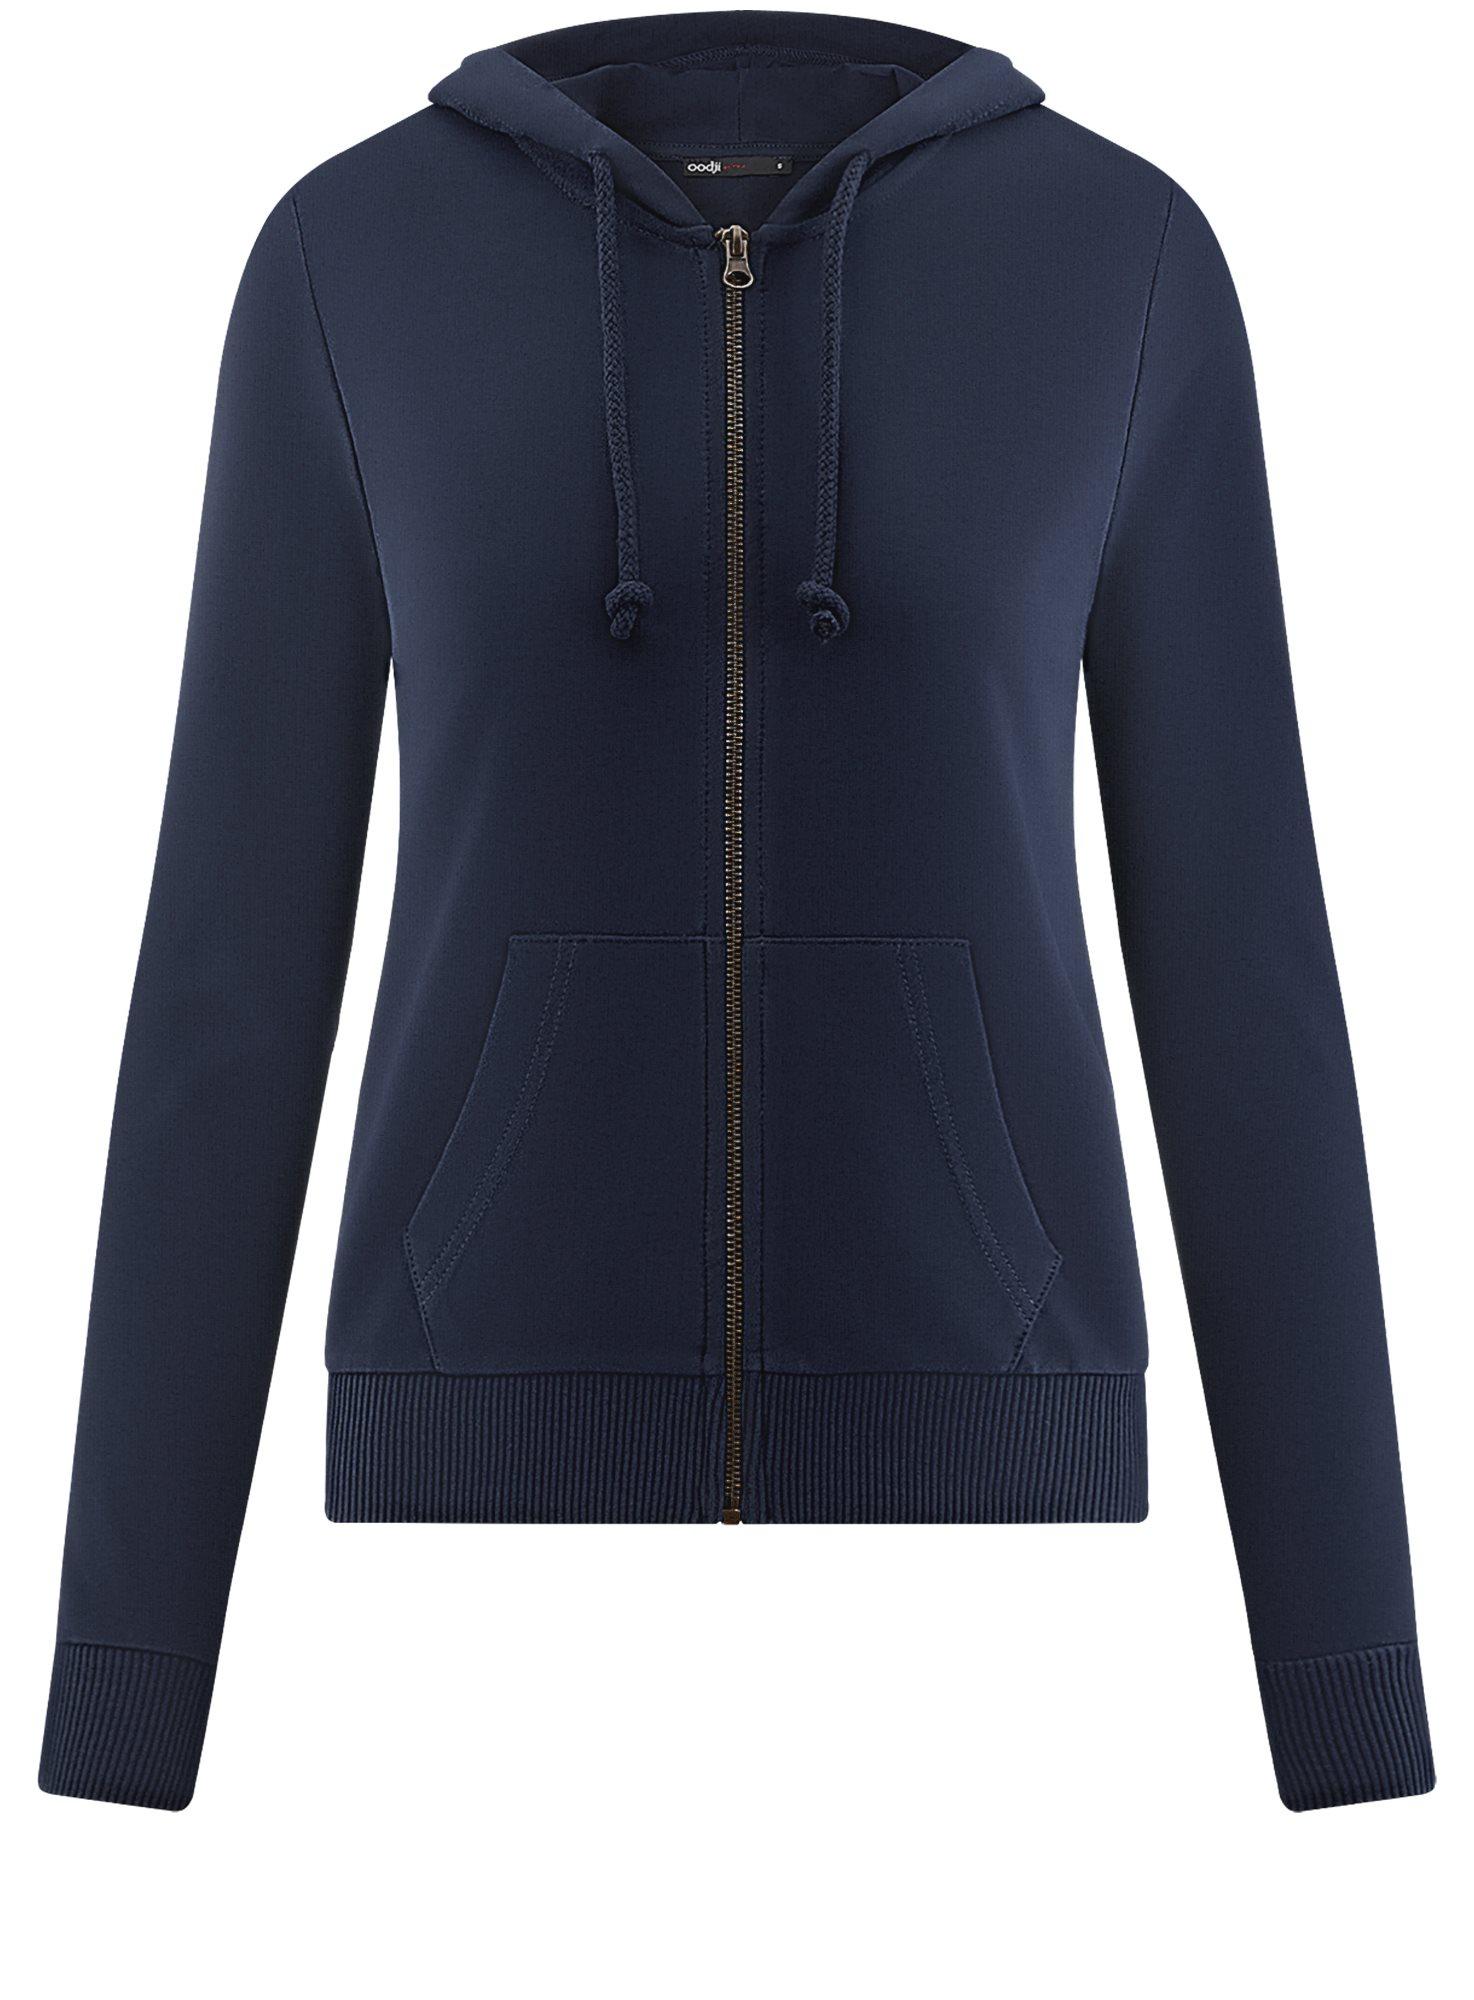 Толстовка на молнии с капюшоном oodji для женщины (синий), 16901079B/35148/7900N